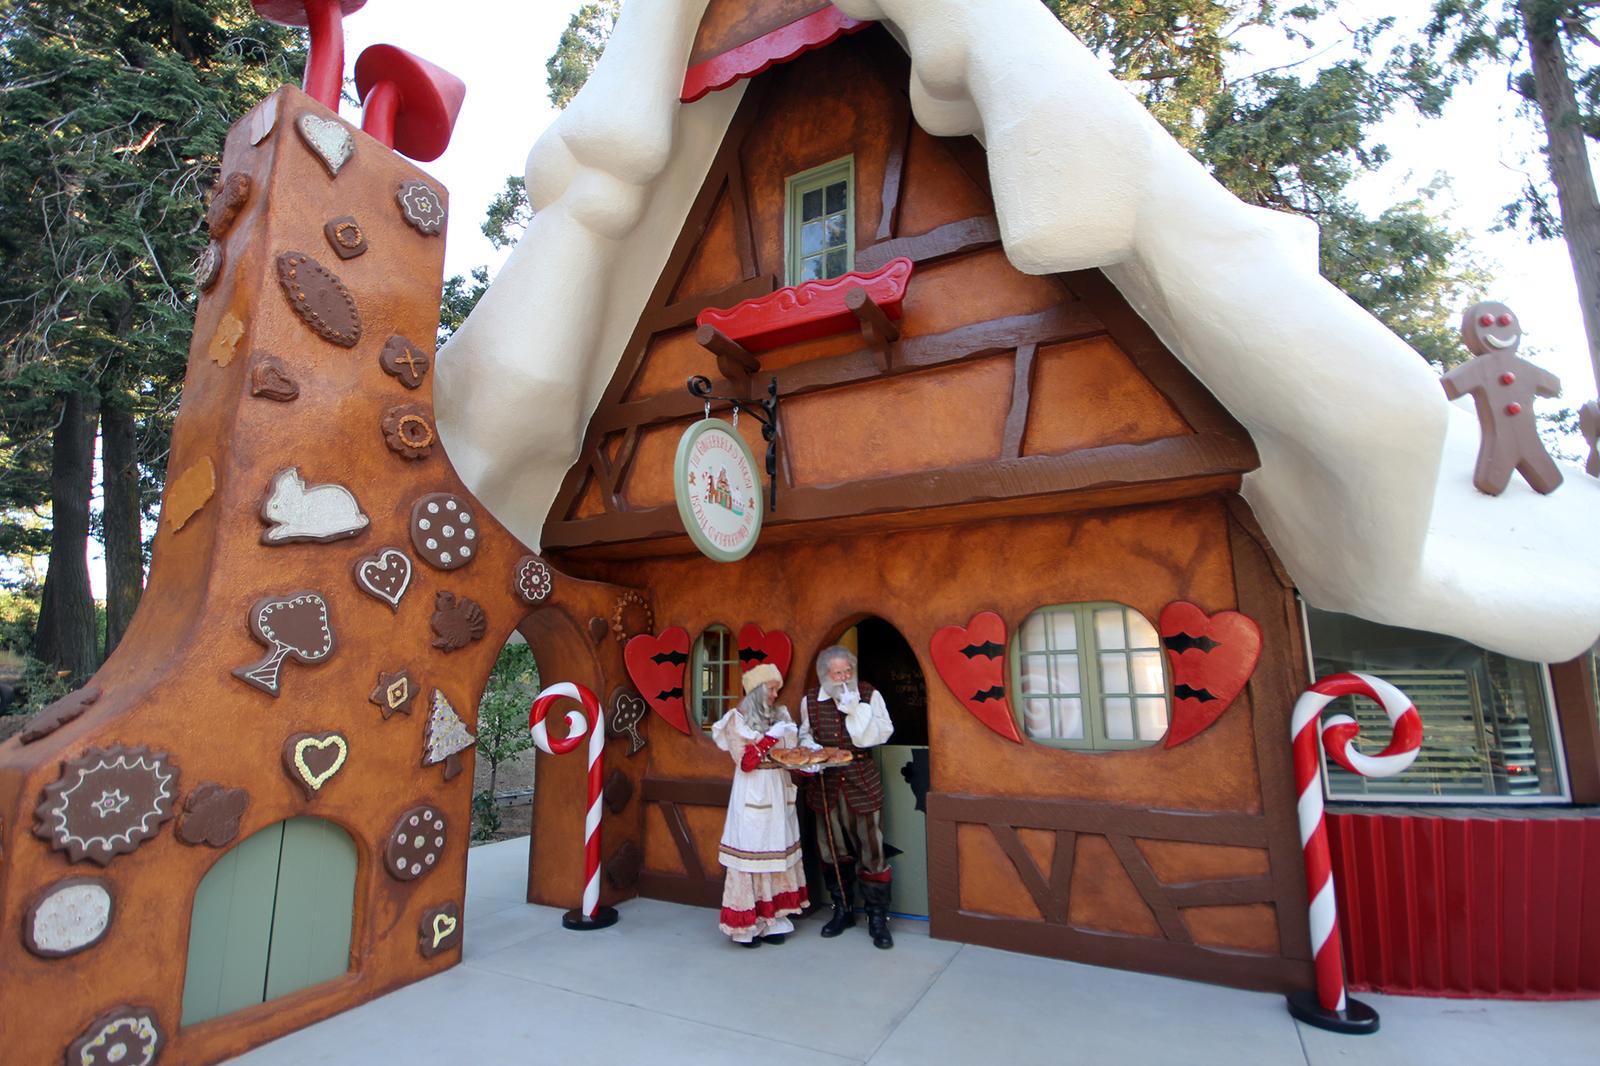 Lake Arrowhead Hotels For Christmas 2020 SkyPark Santa's Village in Lake Arrowhead, California   Kid